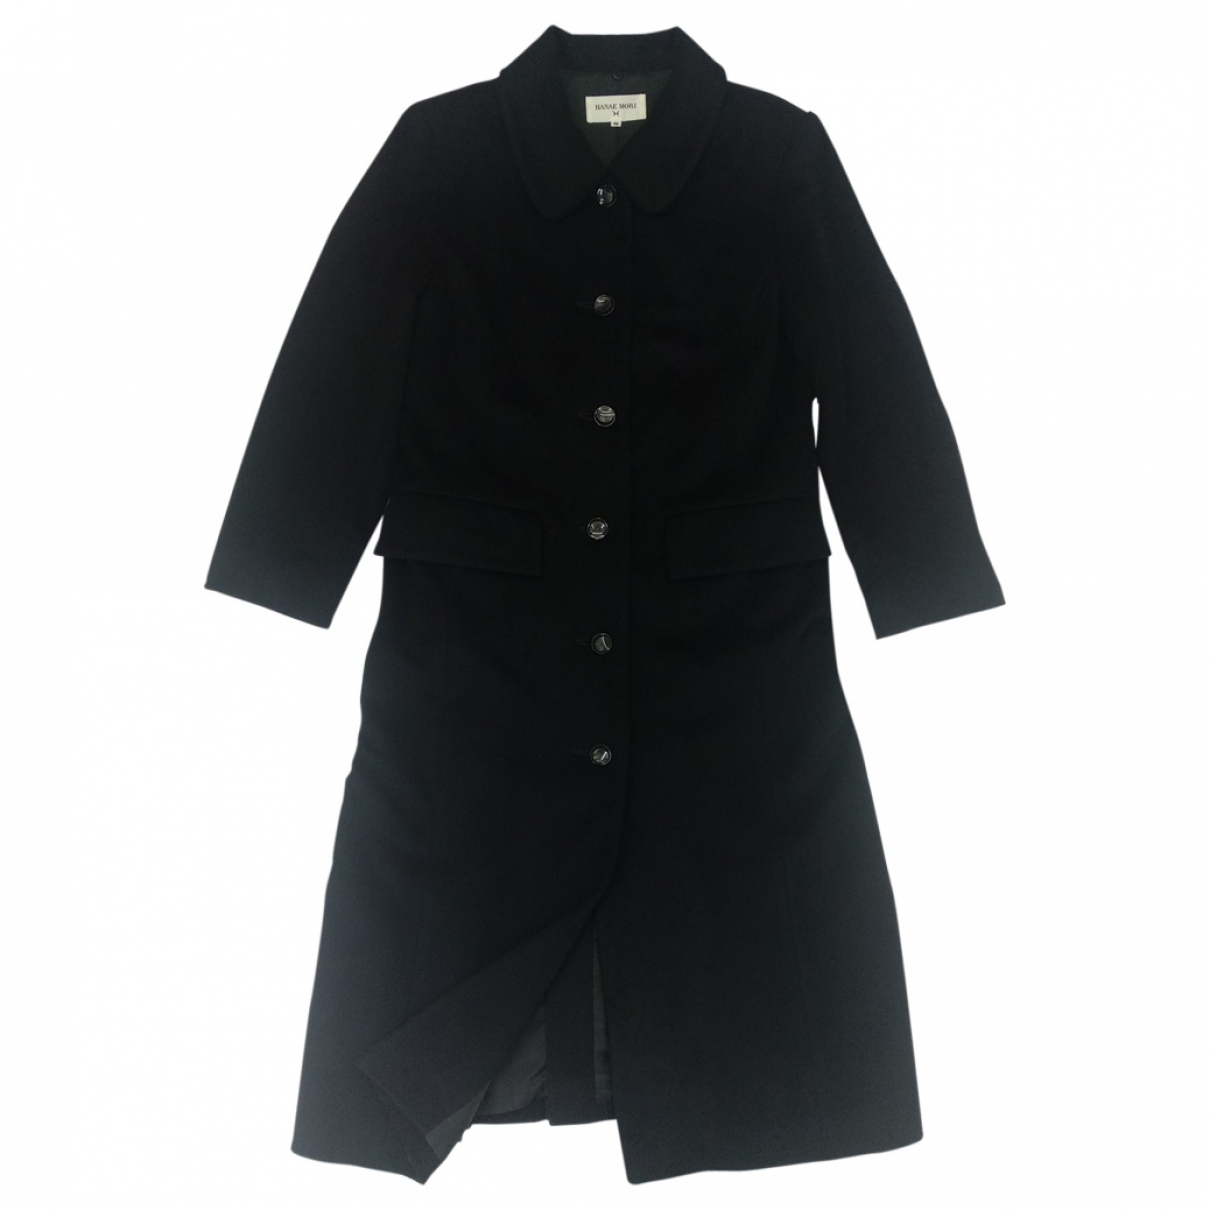 Hanae Mori \N Black Cashmere Trench coat for Women M International